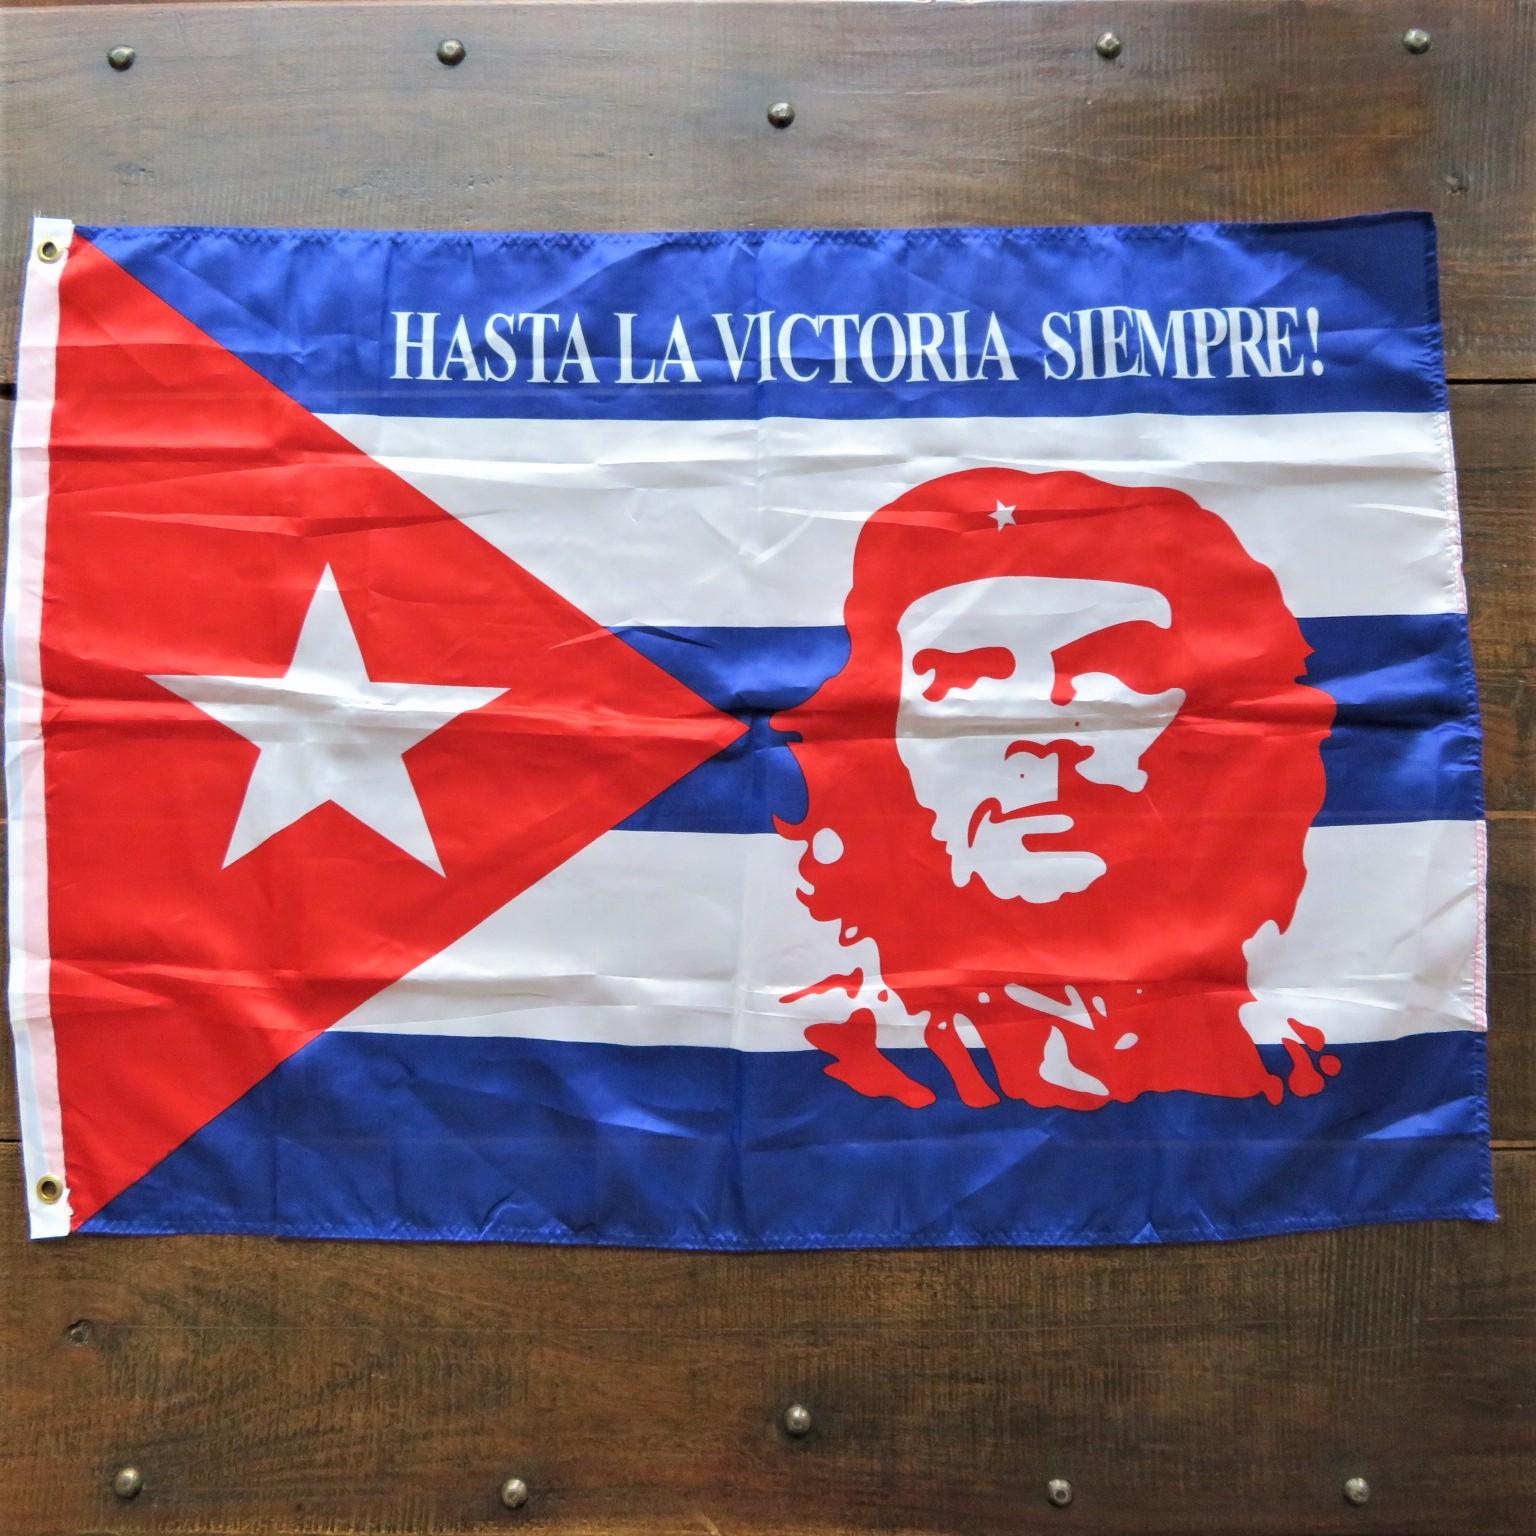 flag-cuba-che-guevara-1